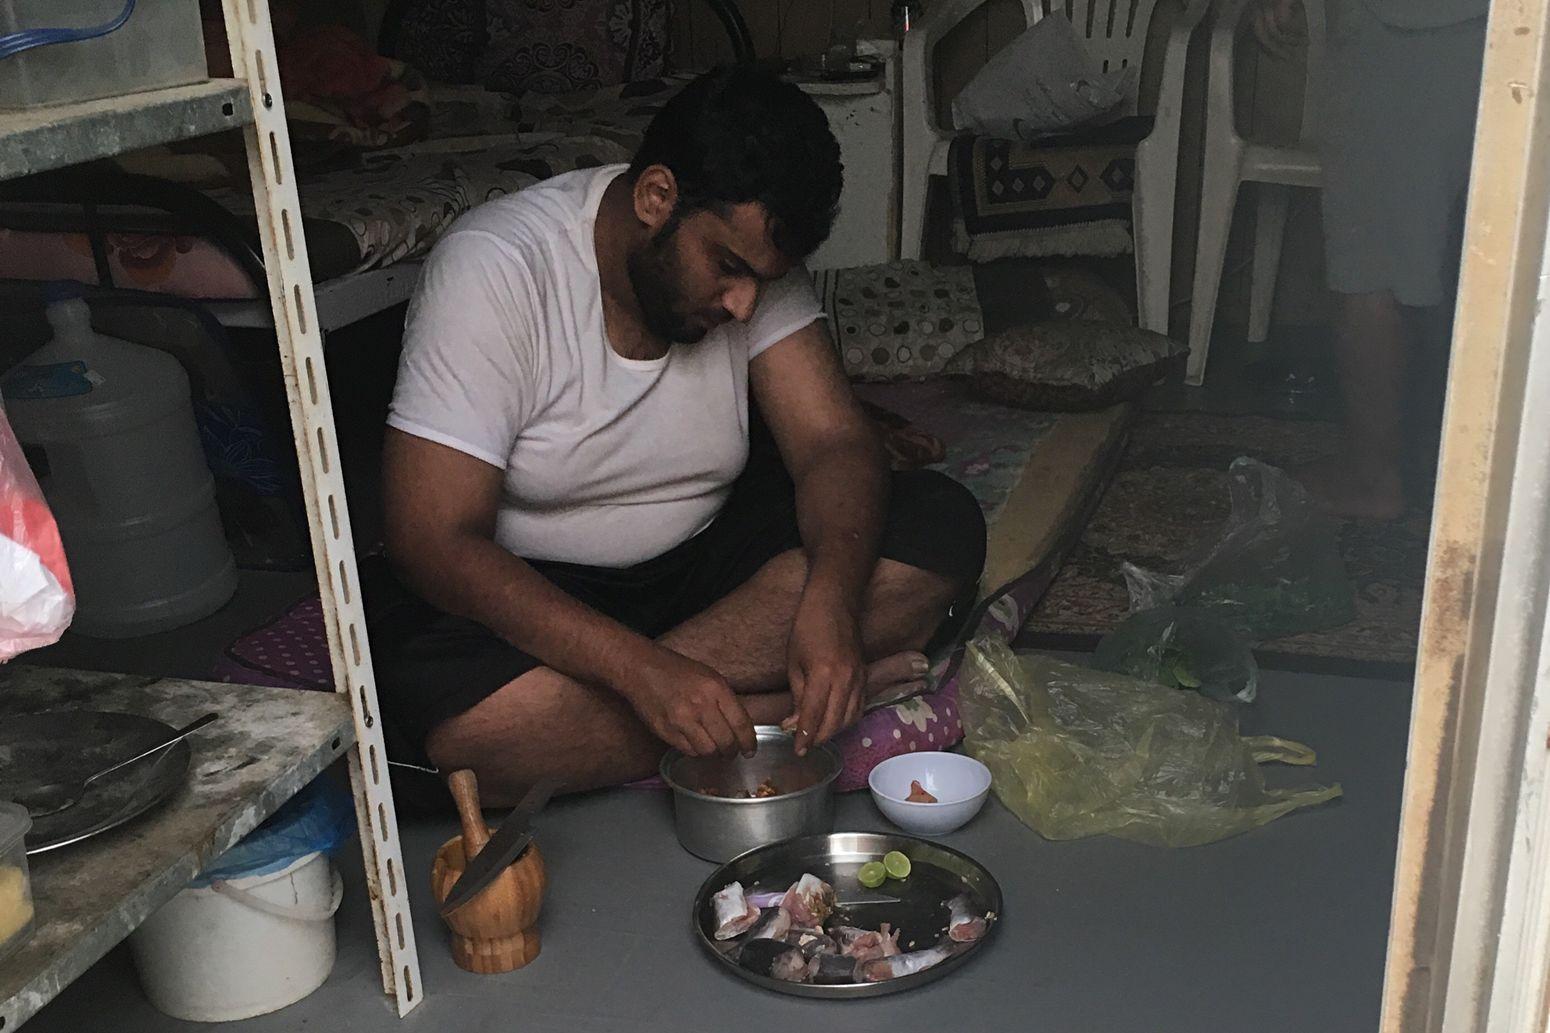 Saudi Saudi Arabia Food Room Indoor Saudia One Man Only Ready-to-eat Cooking